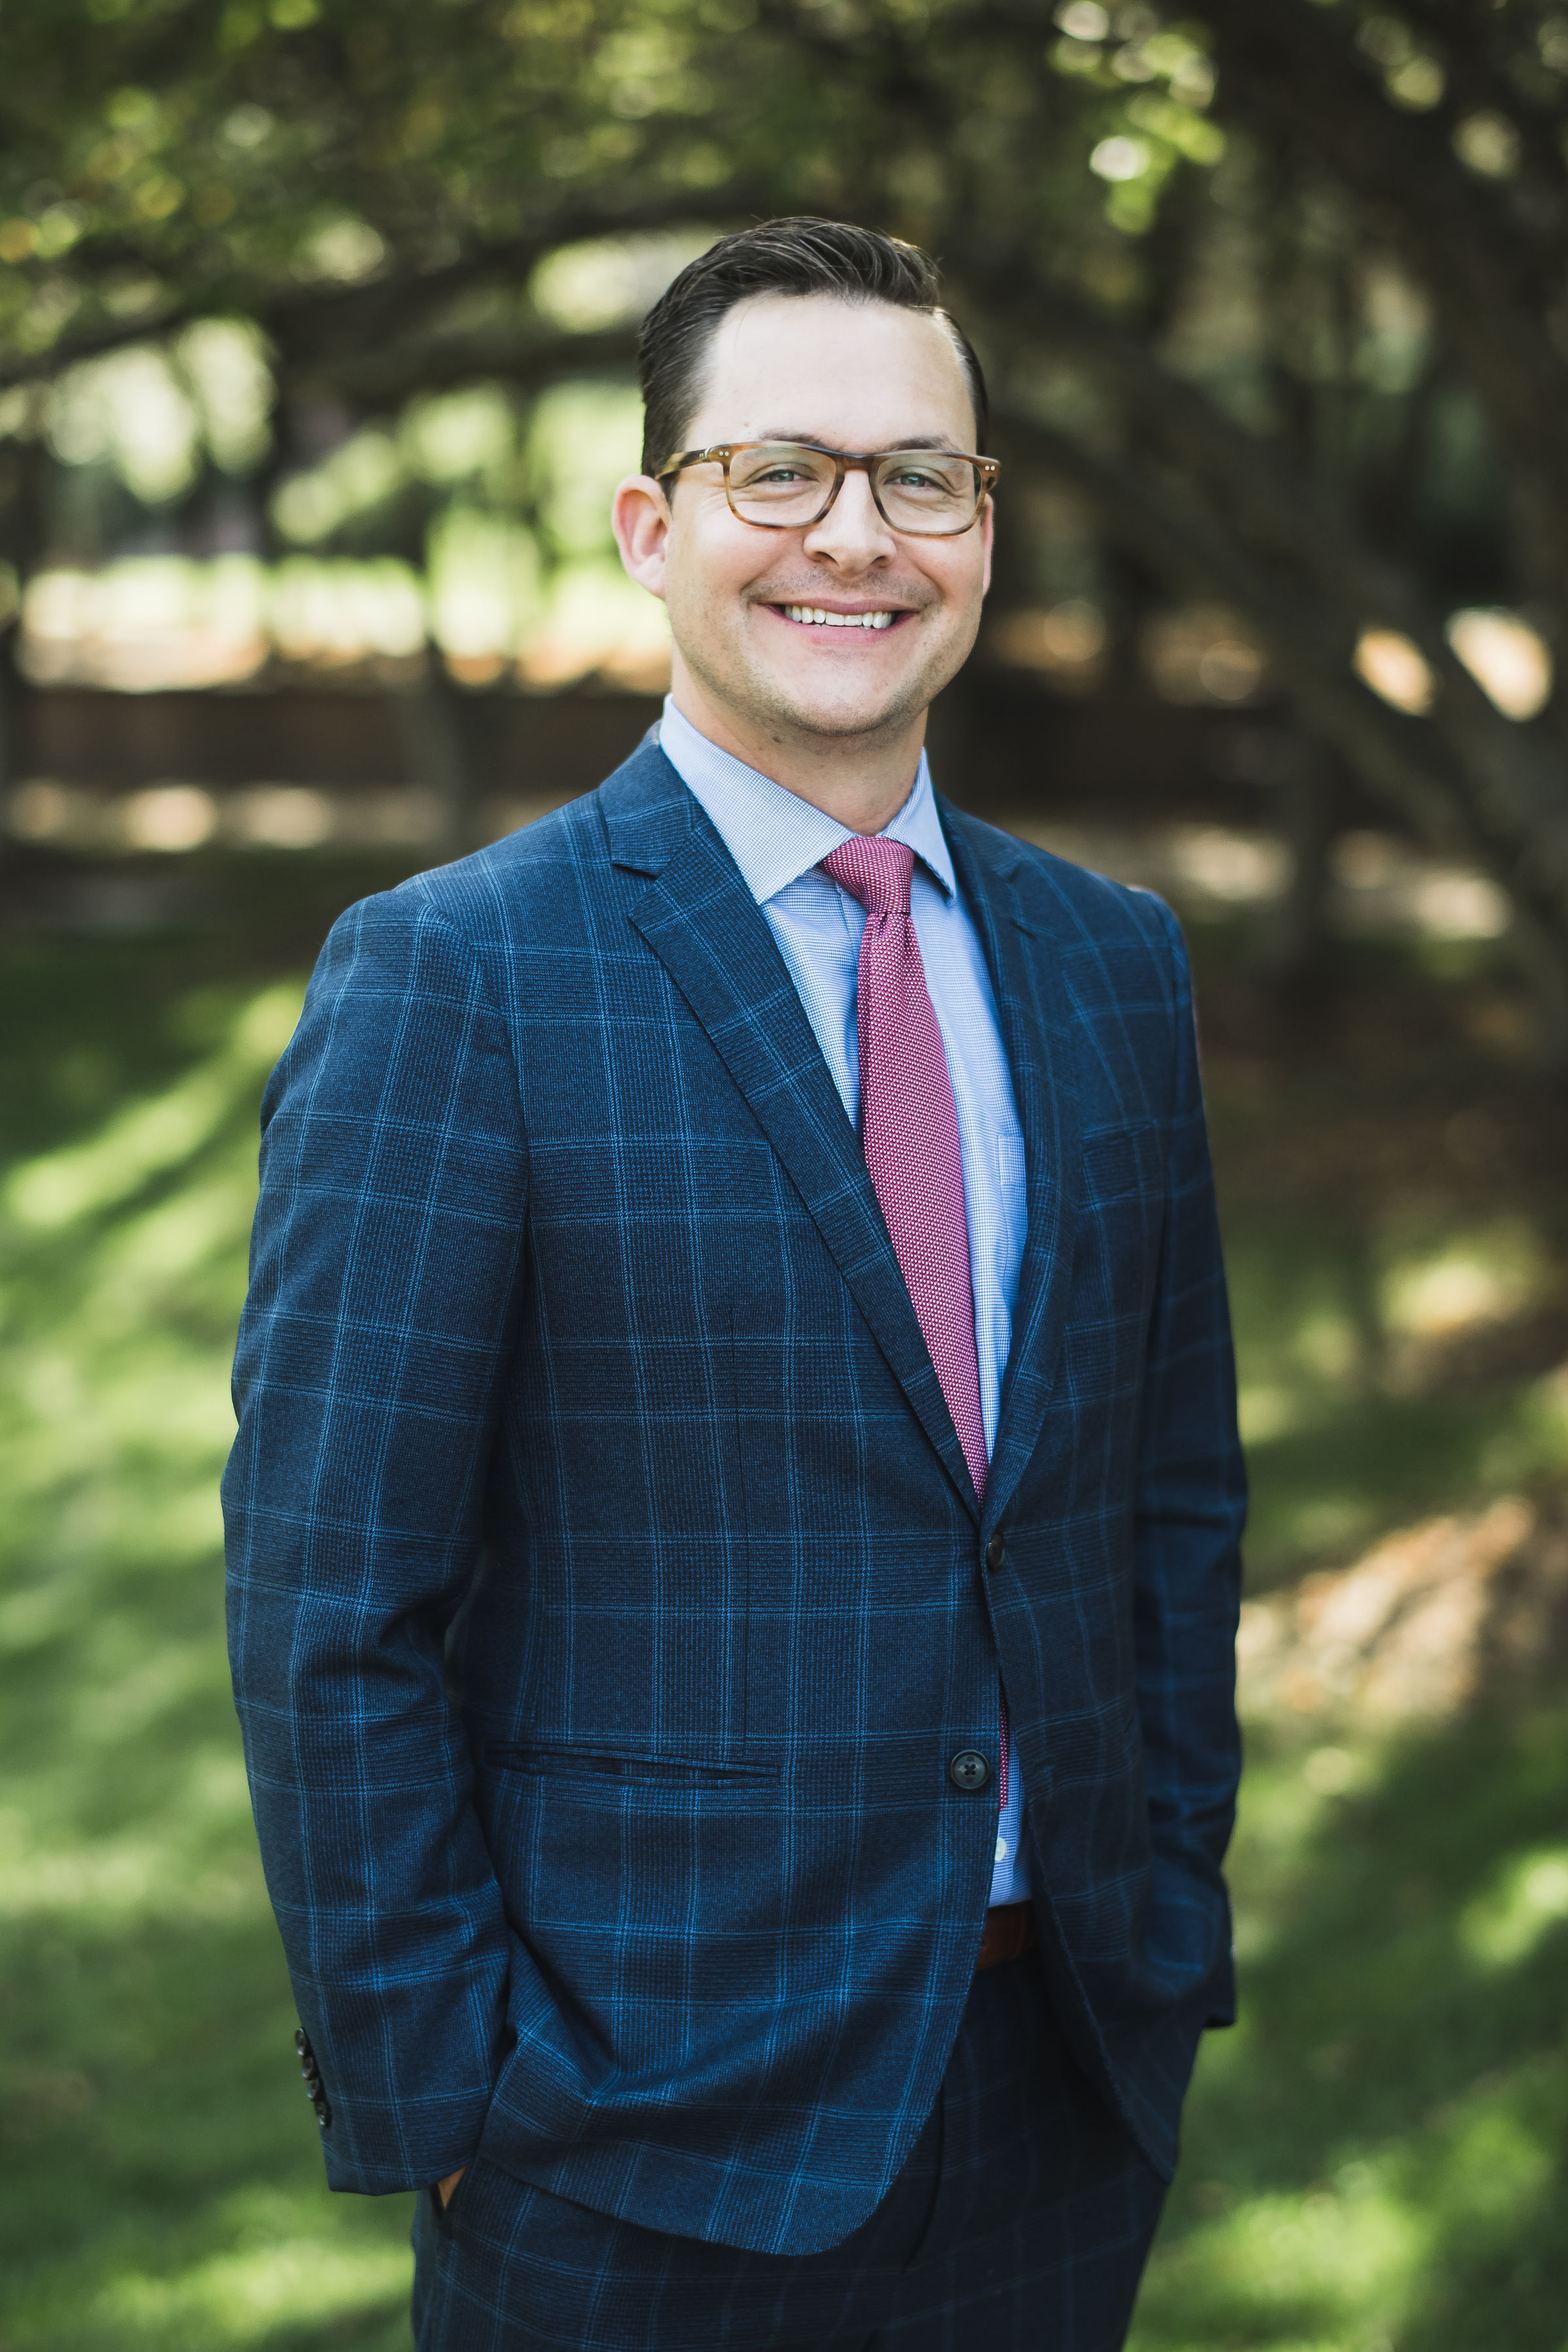 Cory Zafke is an Advisor out of the Great Waters Financial Minnetonka Office